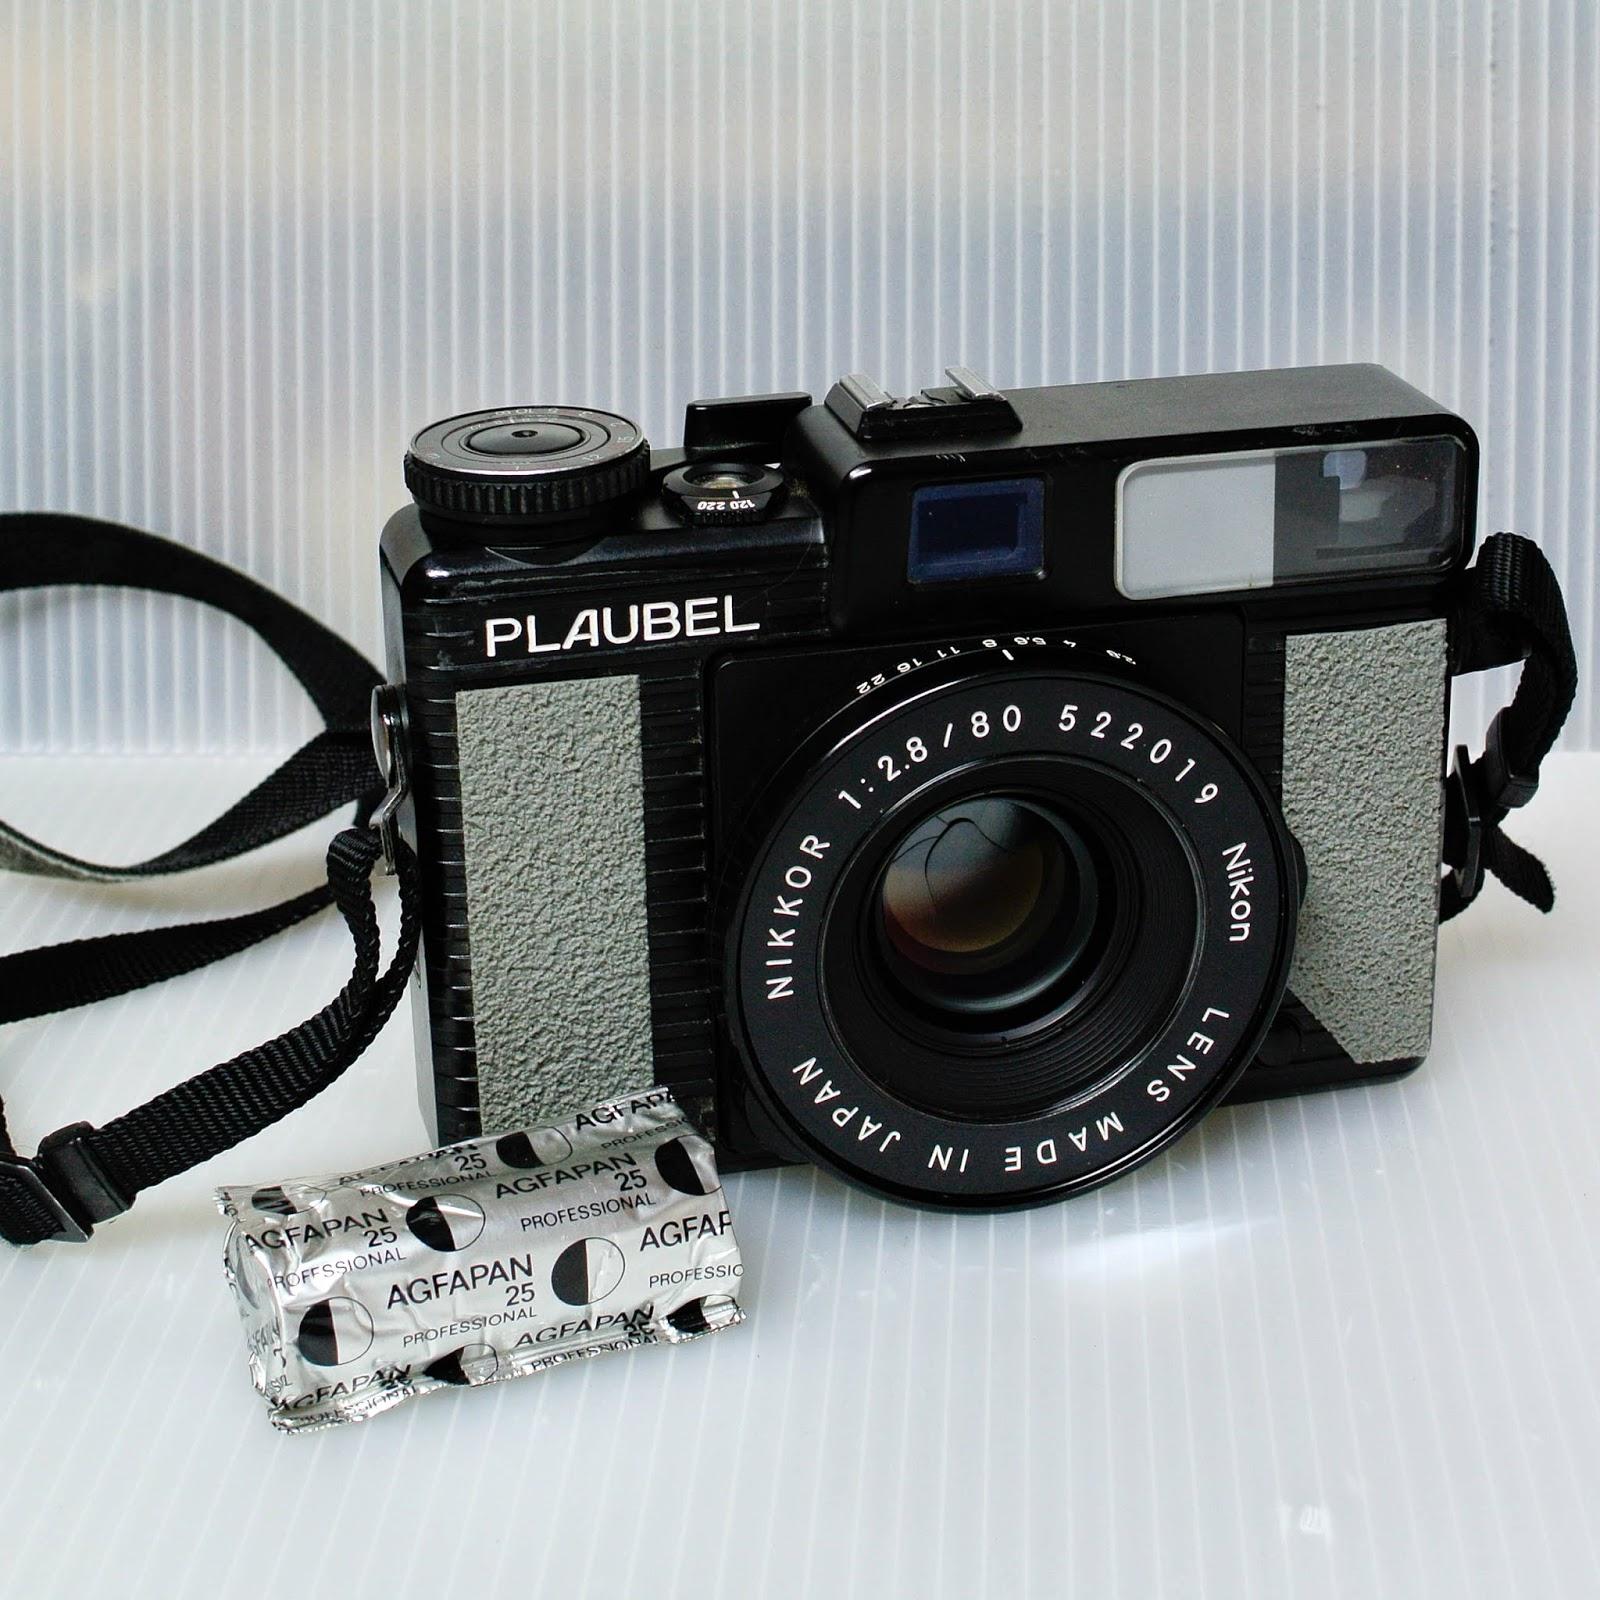 Random Camera Blog: Cameras beyond my budget - The Plaubel ...